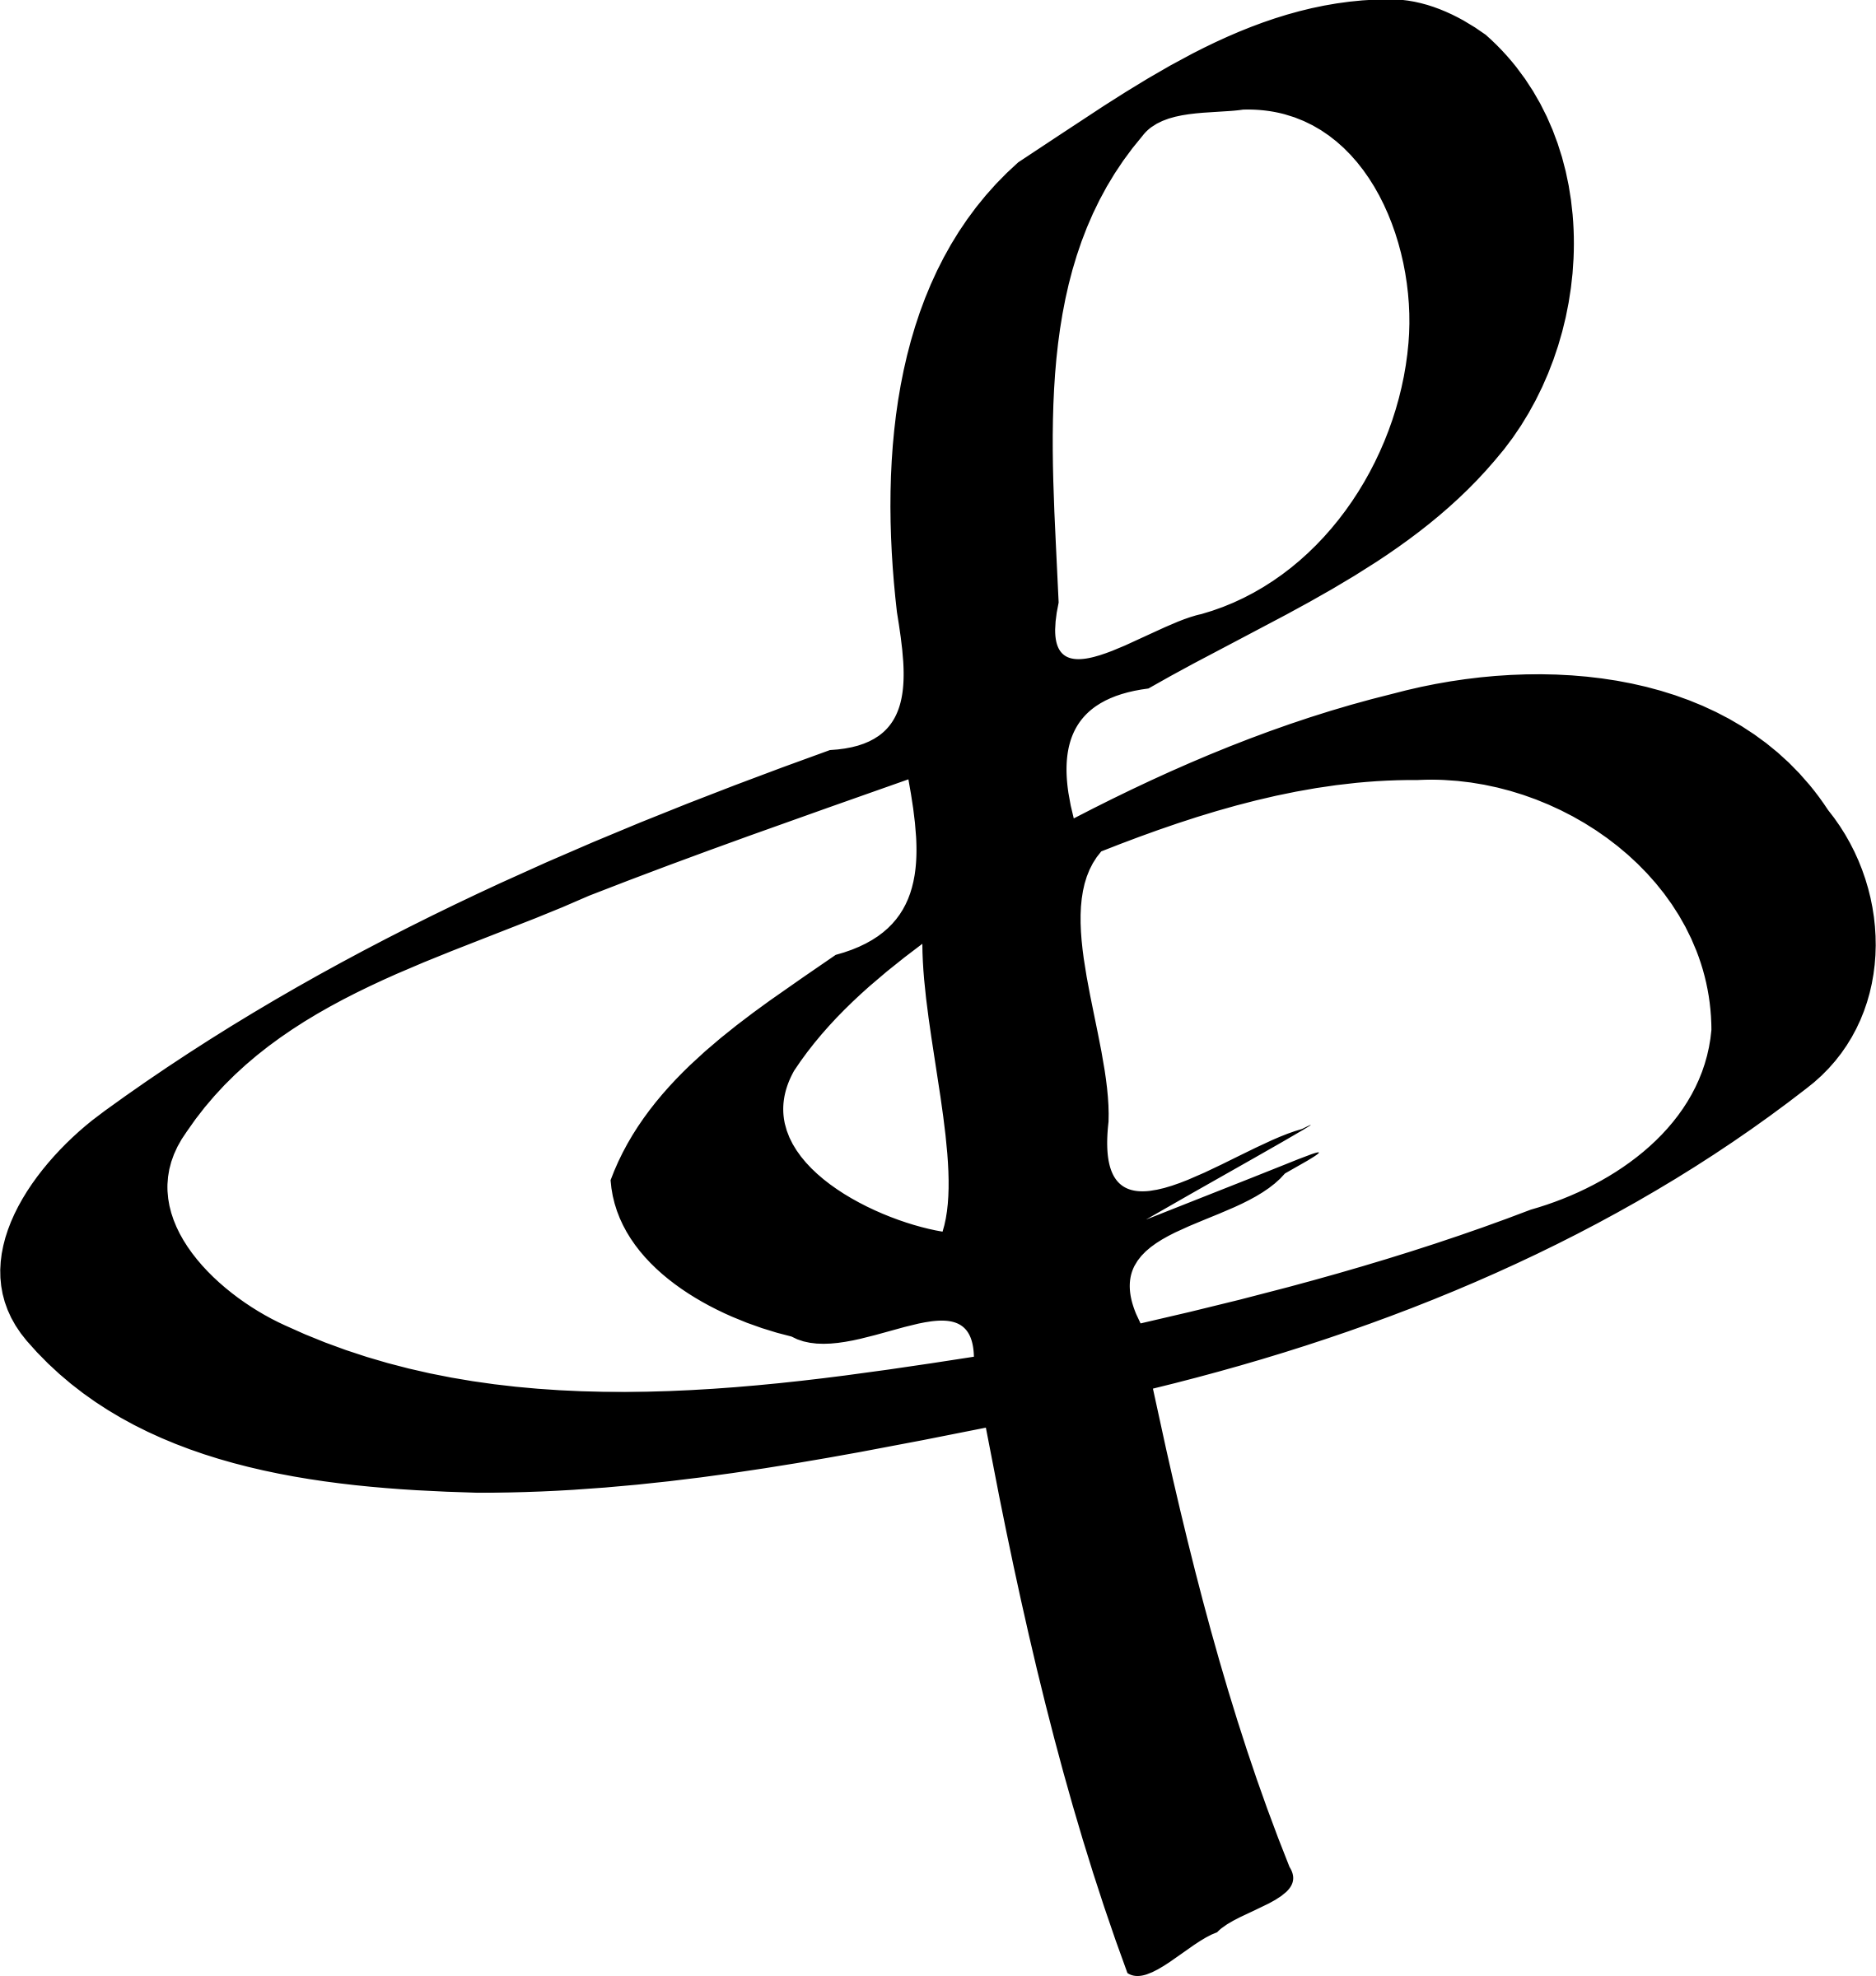 clipart g clef rh openclipart org treble clef clip art vector treble clef symbol clip art